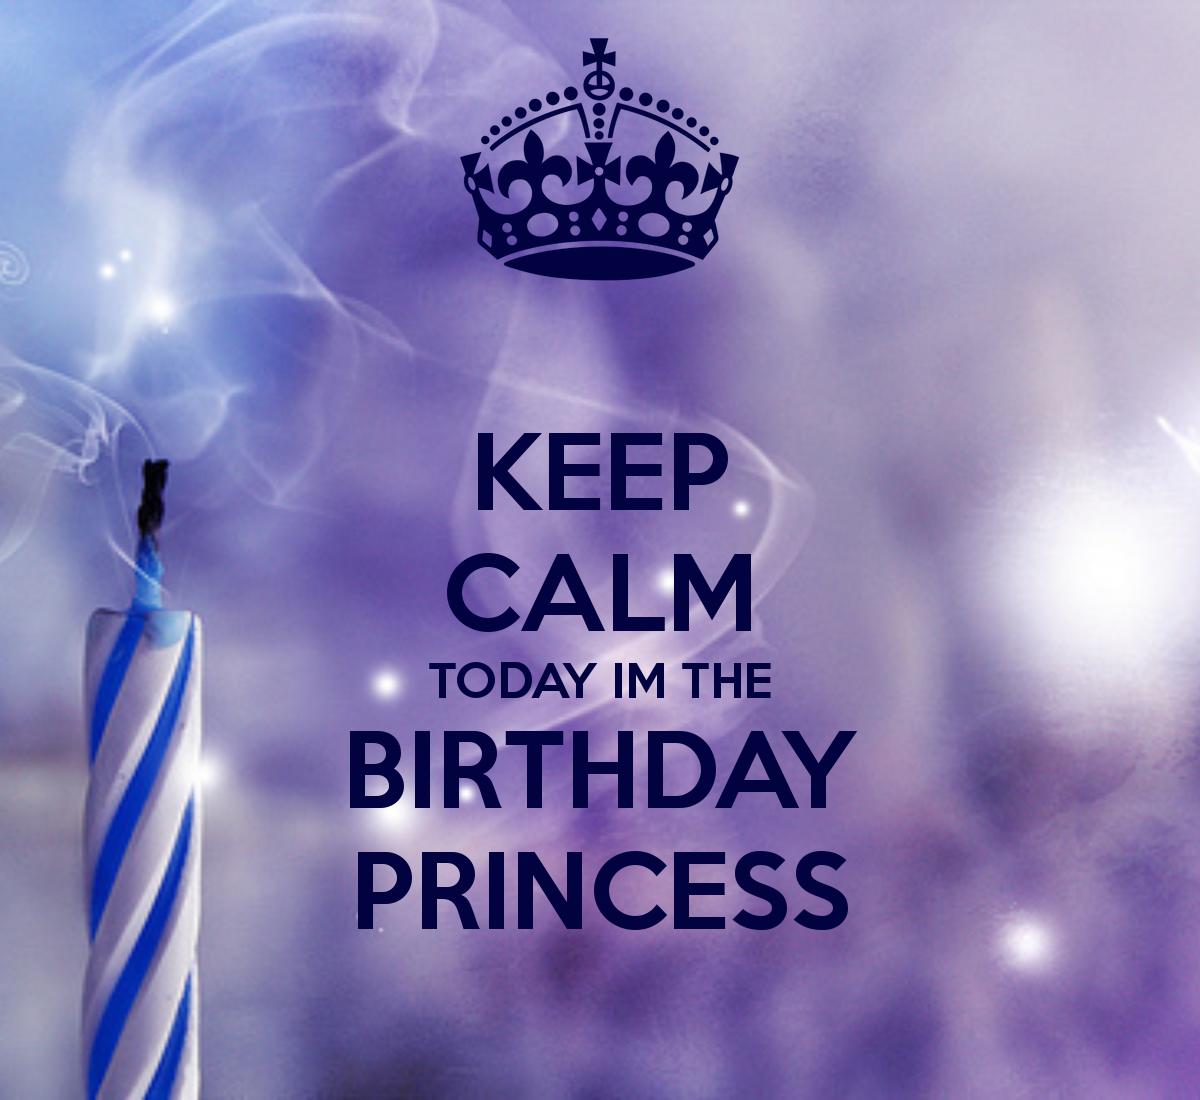 KEEP CALM TODAY IM THE BIRTHDAY PRINCESS  Its my birthday, Happy